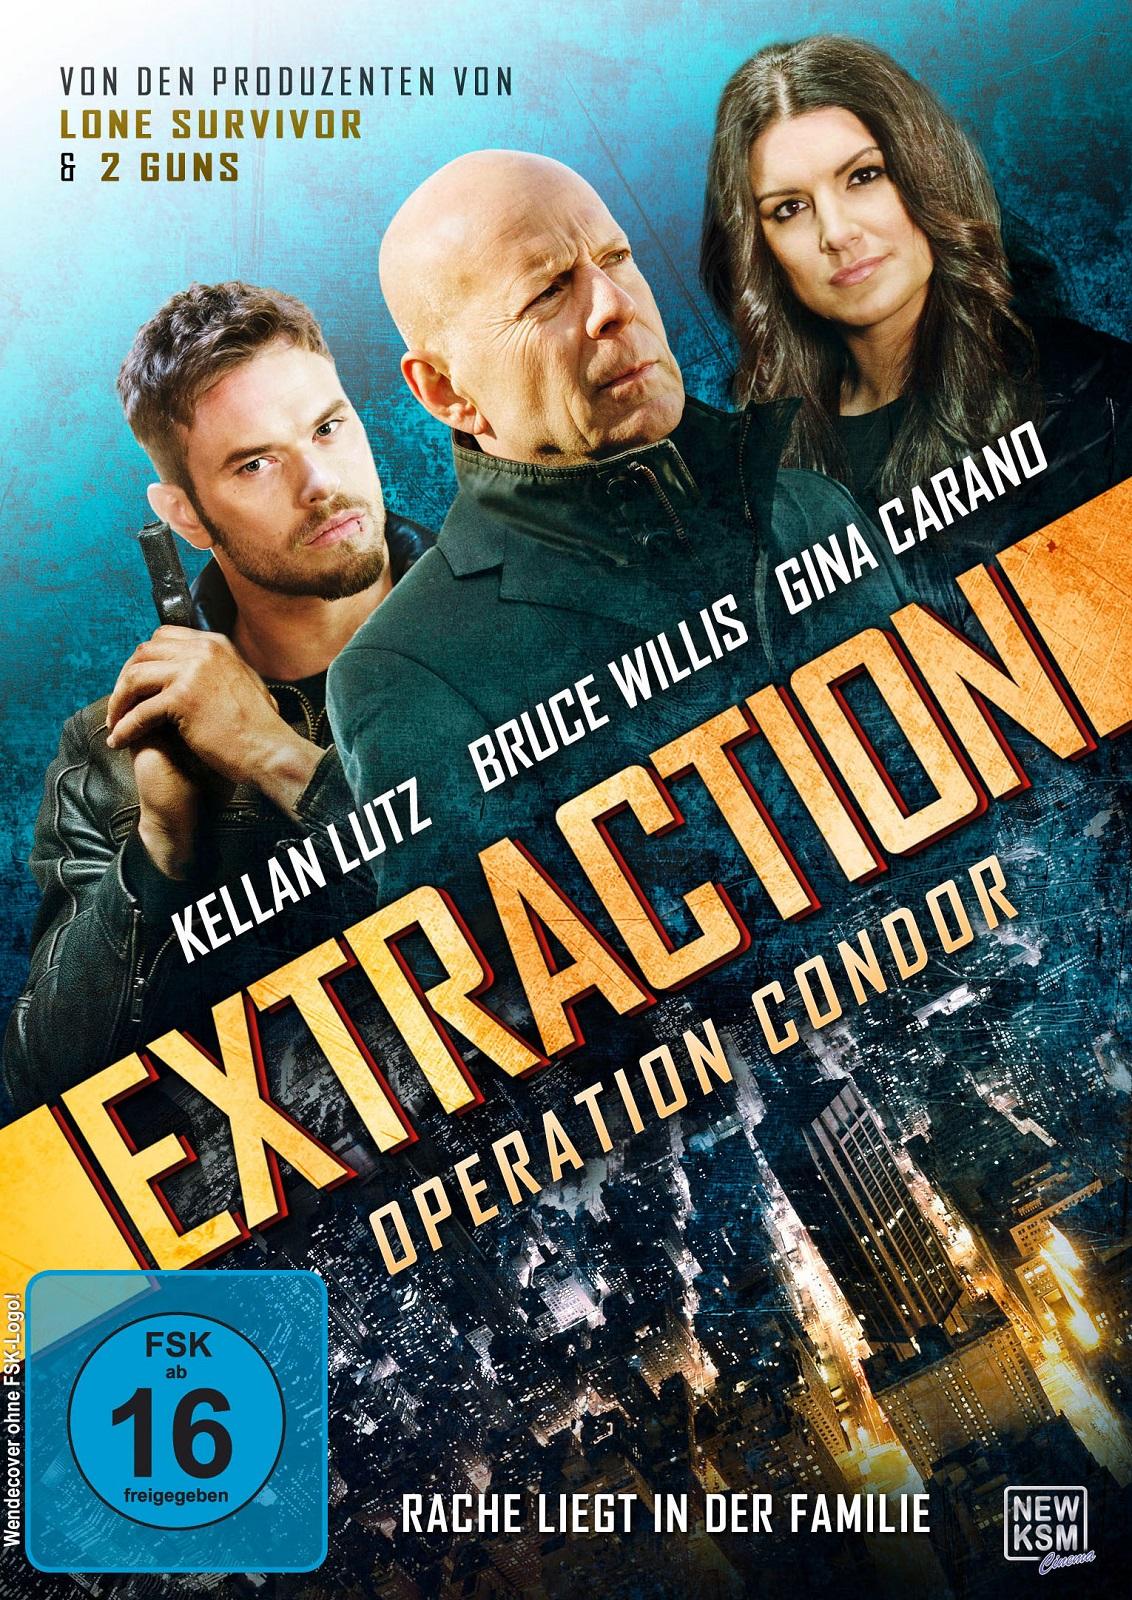 Extraction - Operation Condor - Film 2015 - FILMSTARTS.de Bruce Willis